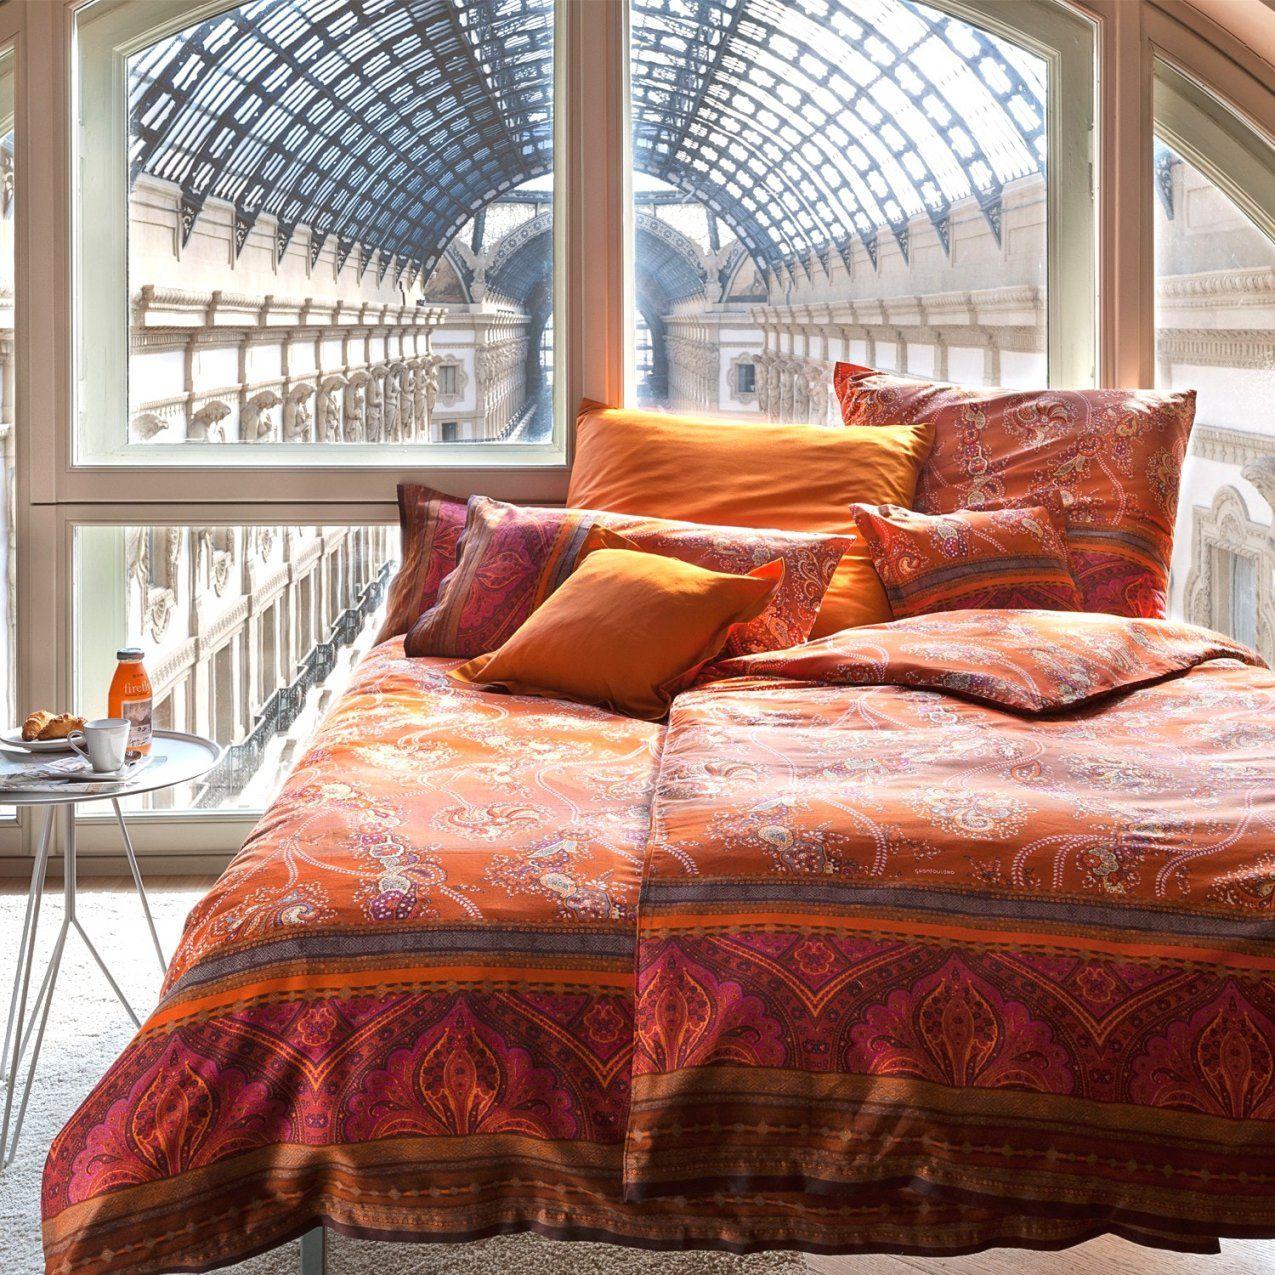 Bassetti Bettwäsche 155x220 Reduziert Haus Design Ideen